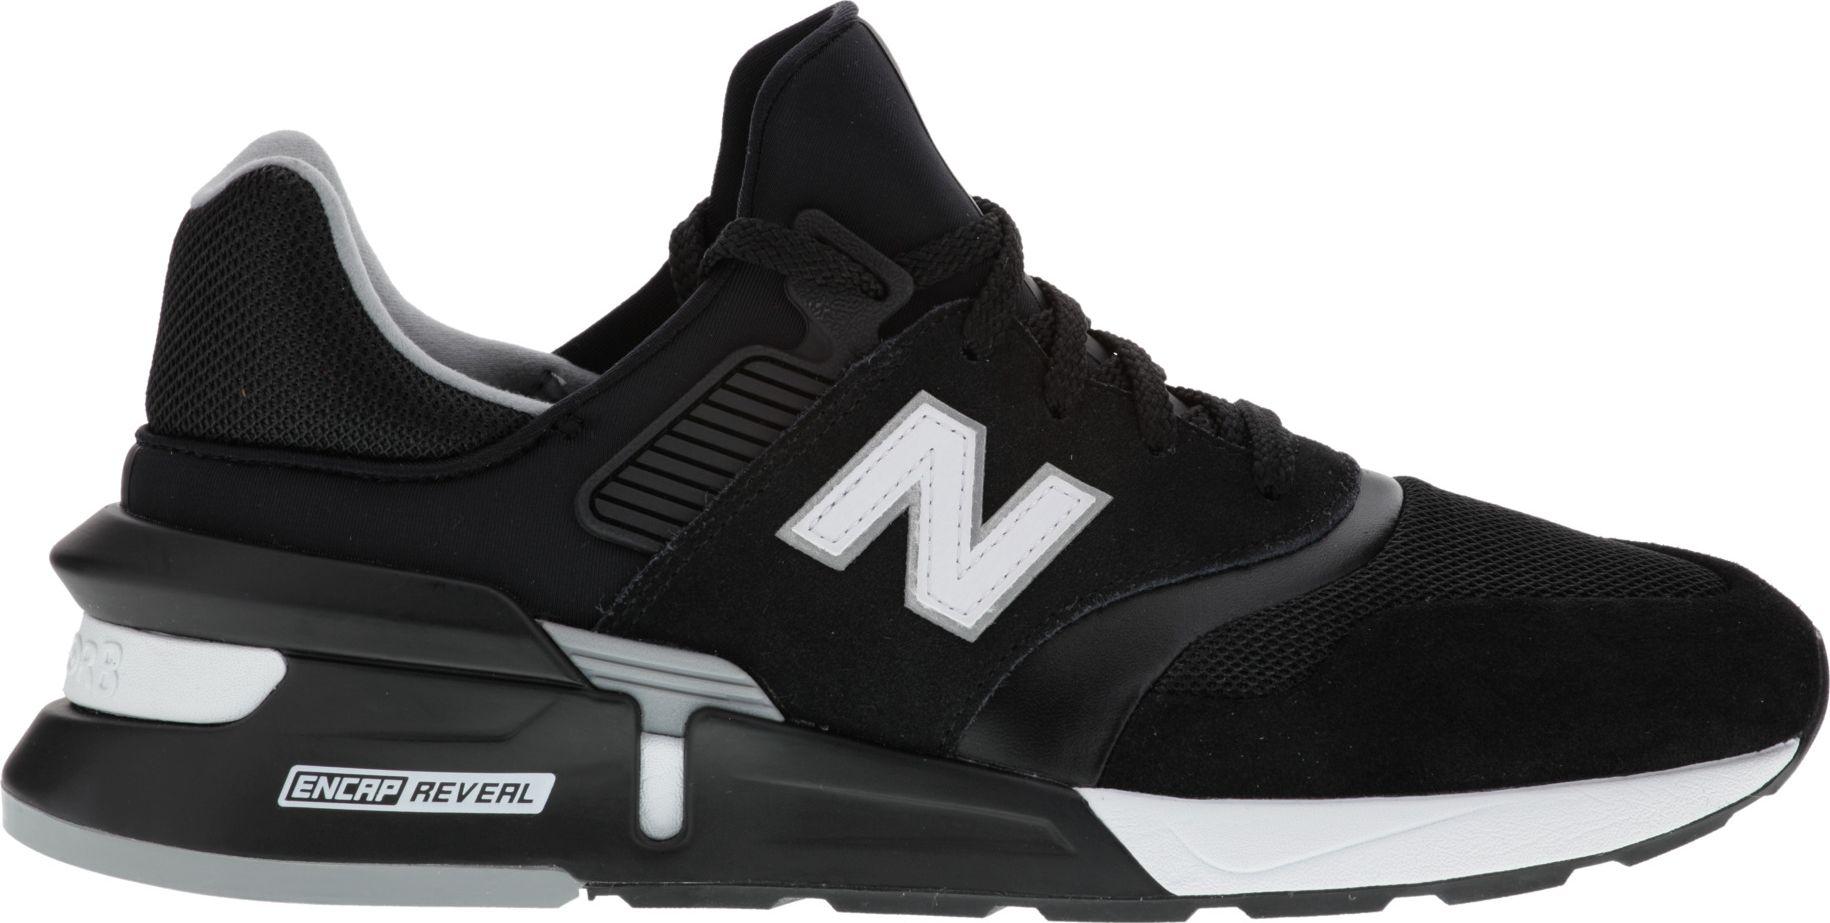 New Balance MS997 Sport T3 Black/White 44